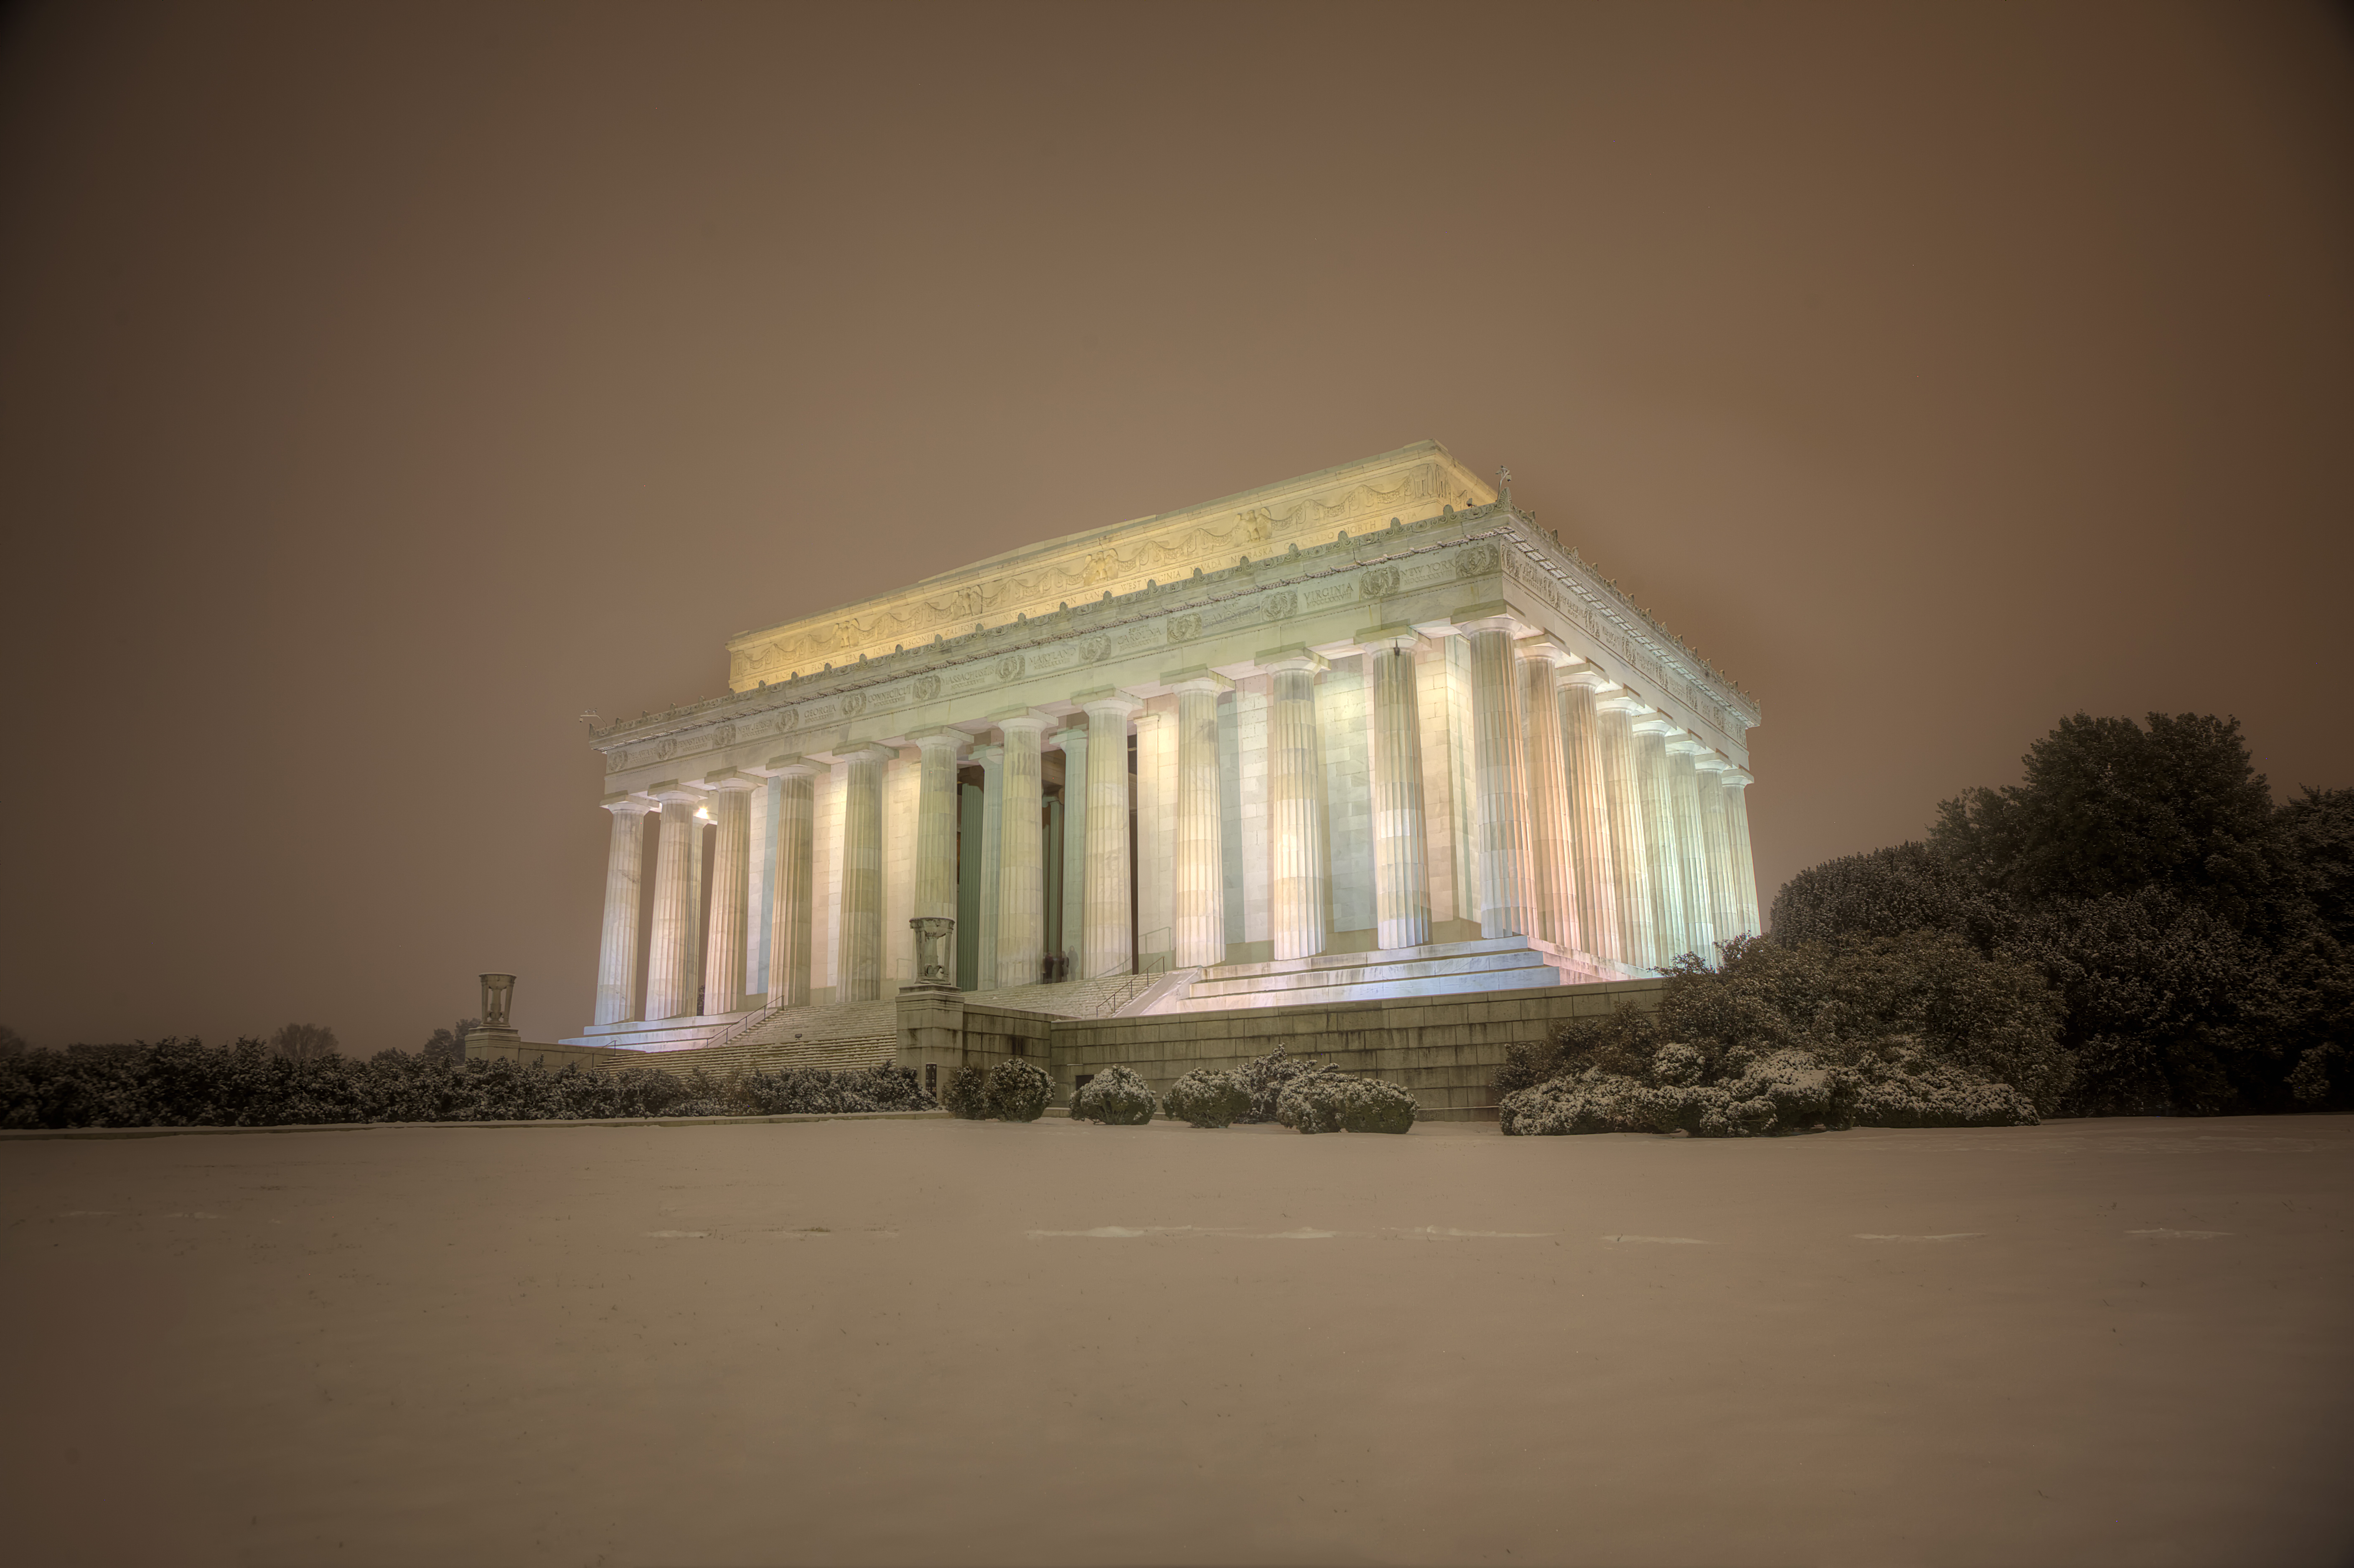 Washington DC - Part 109